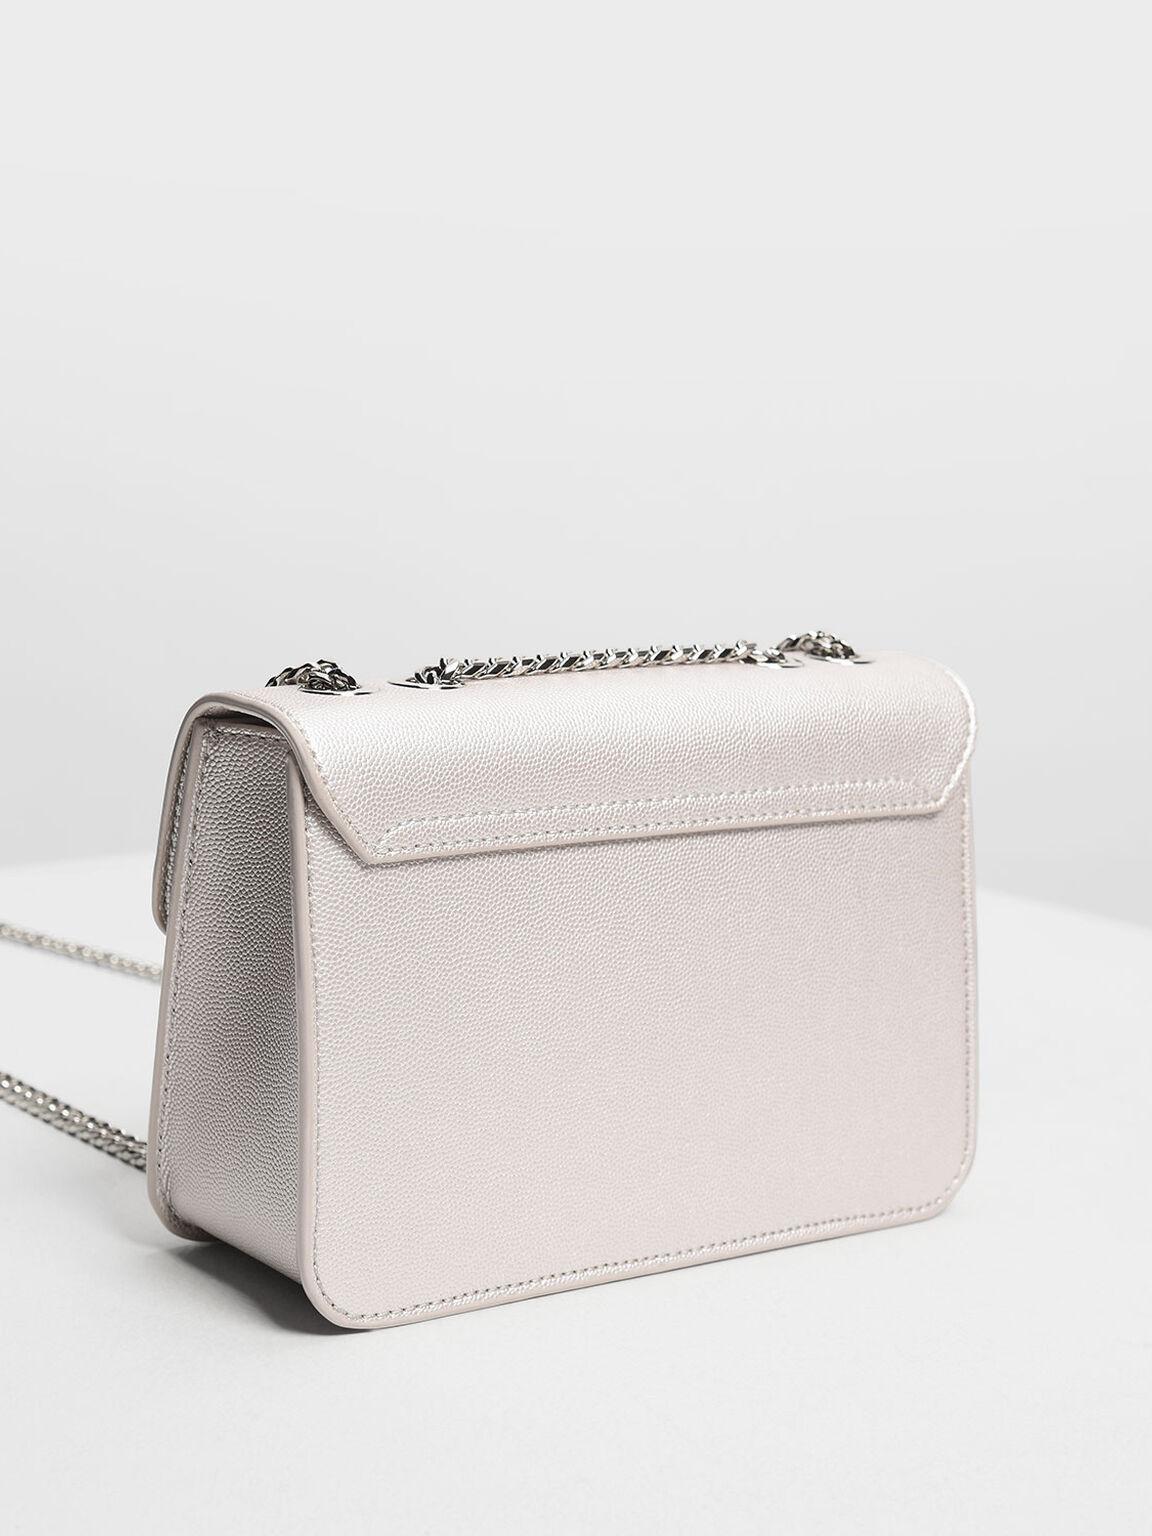 Embellished Push Lock Clutch, Pearl, hi-res